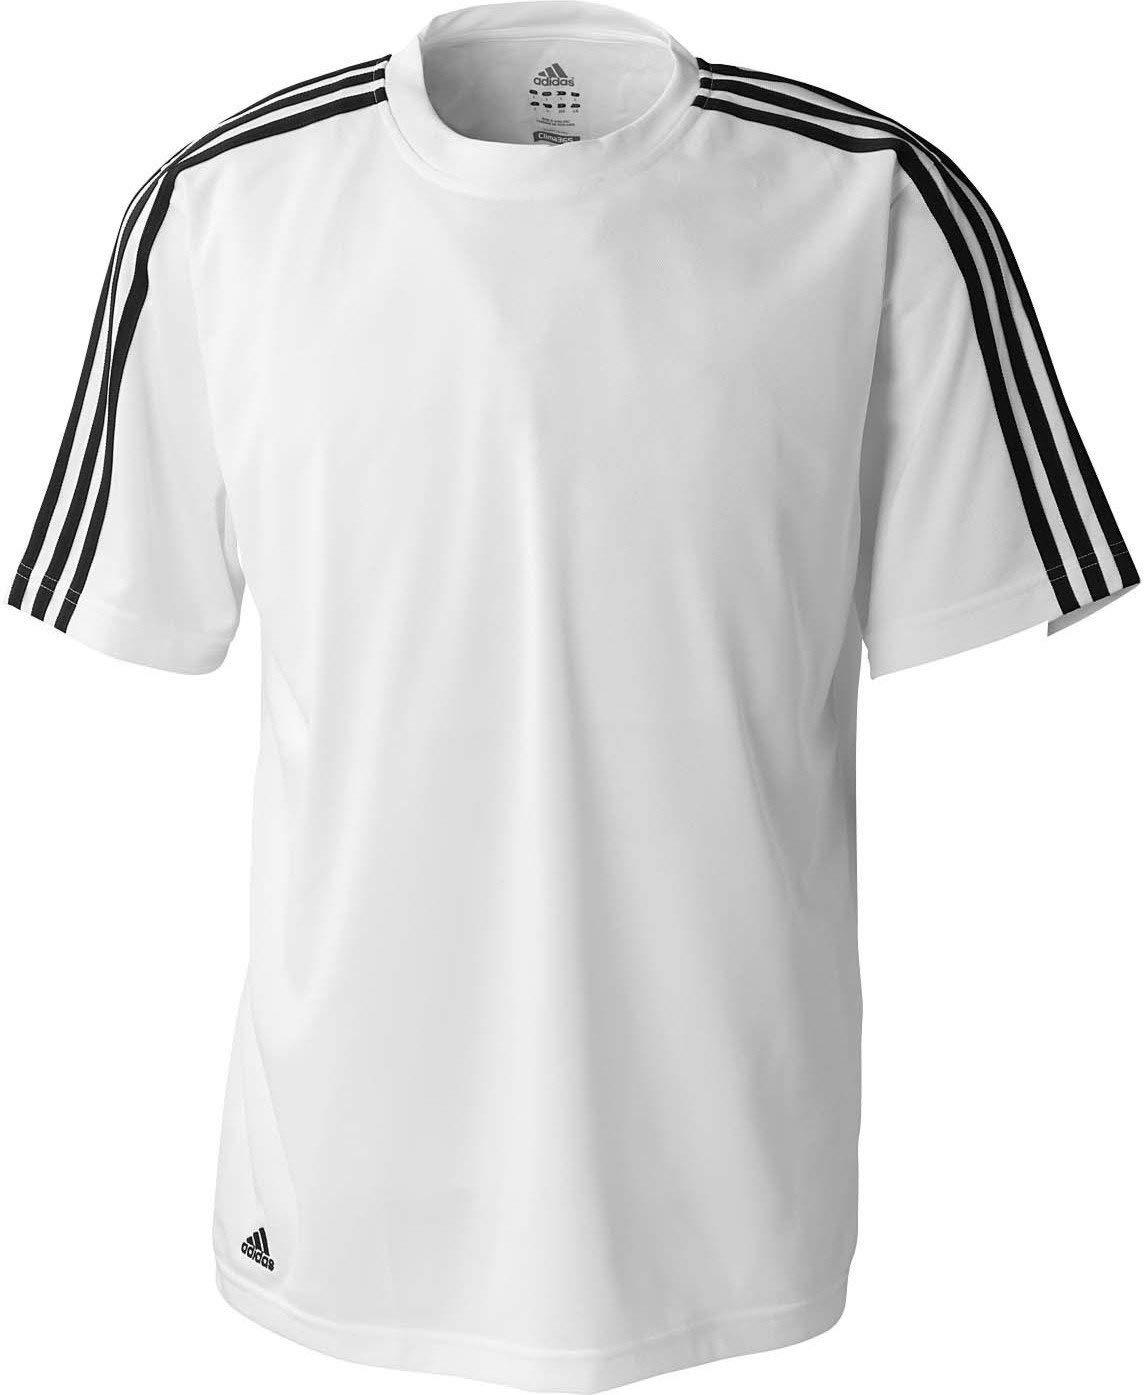 amazon.com: adidas climalite 3-stripes golf tee: sports u0026 outdoors PCYRHZV